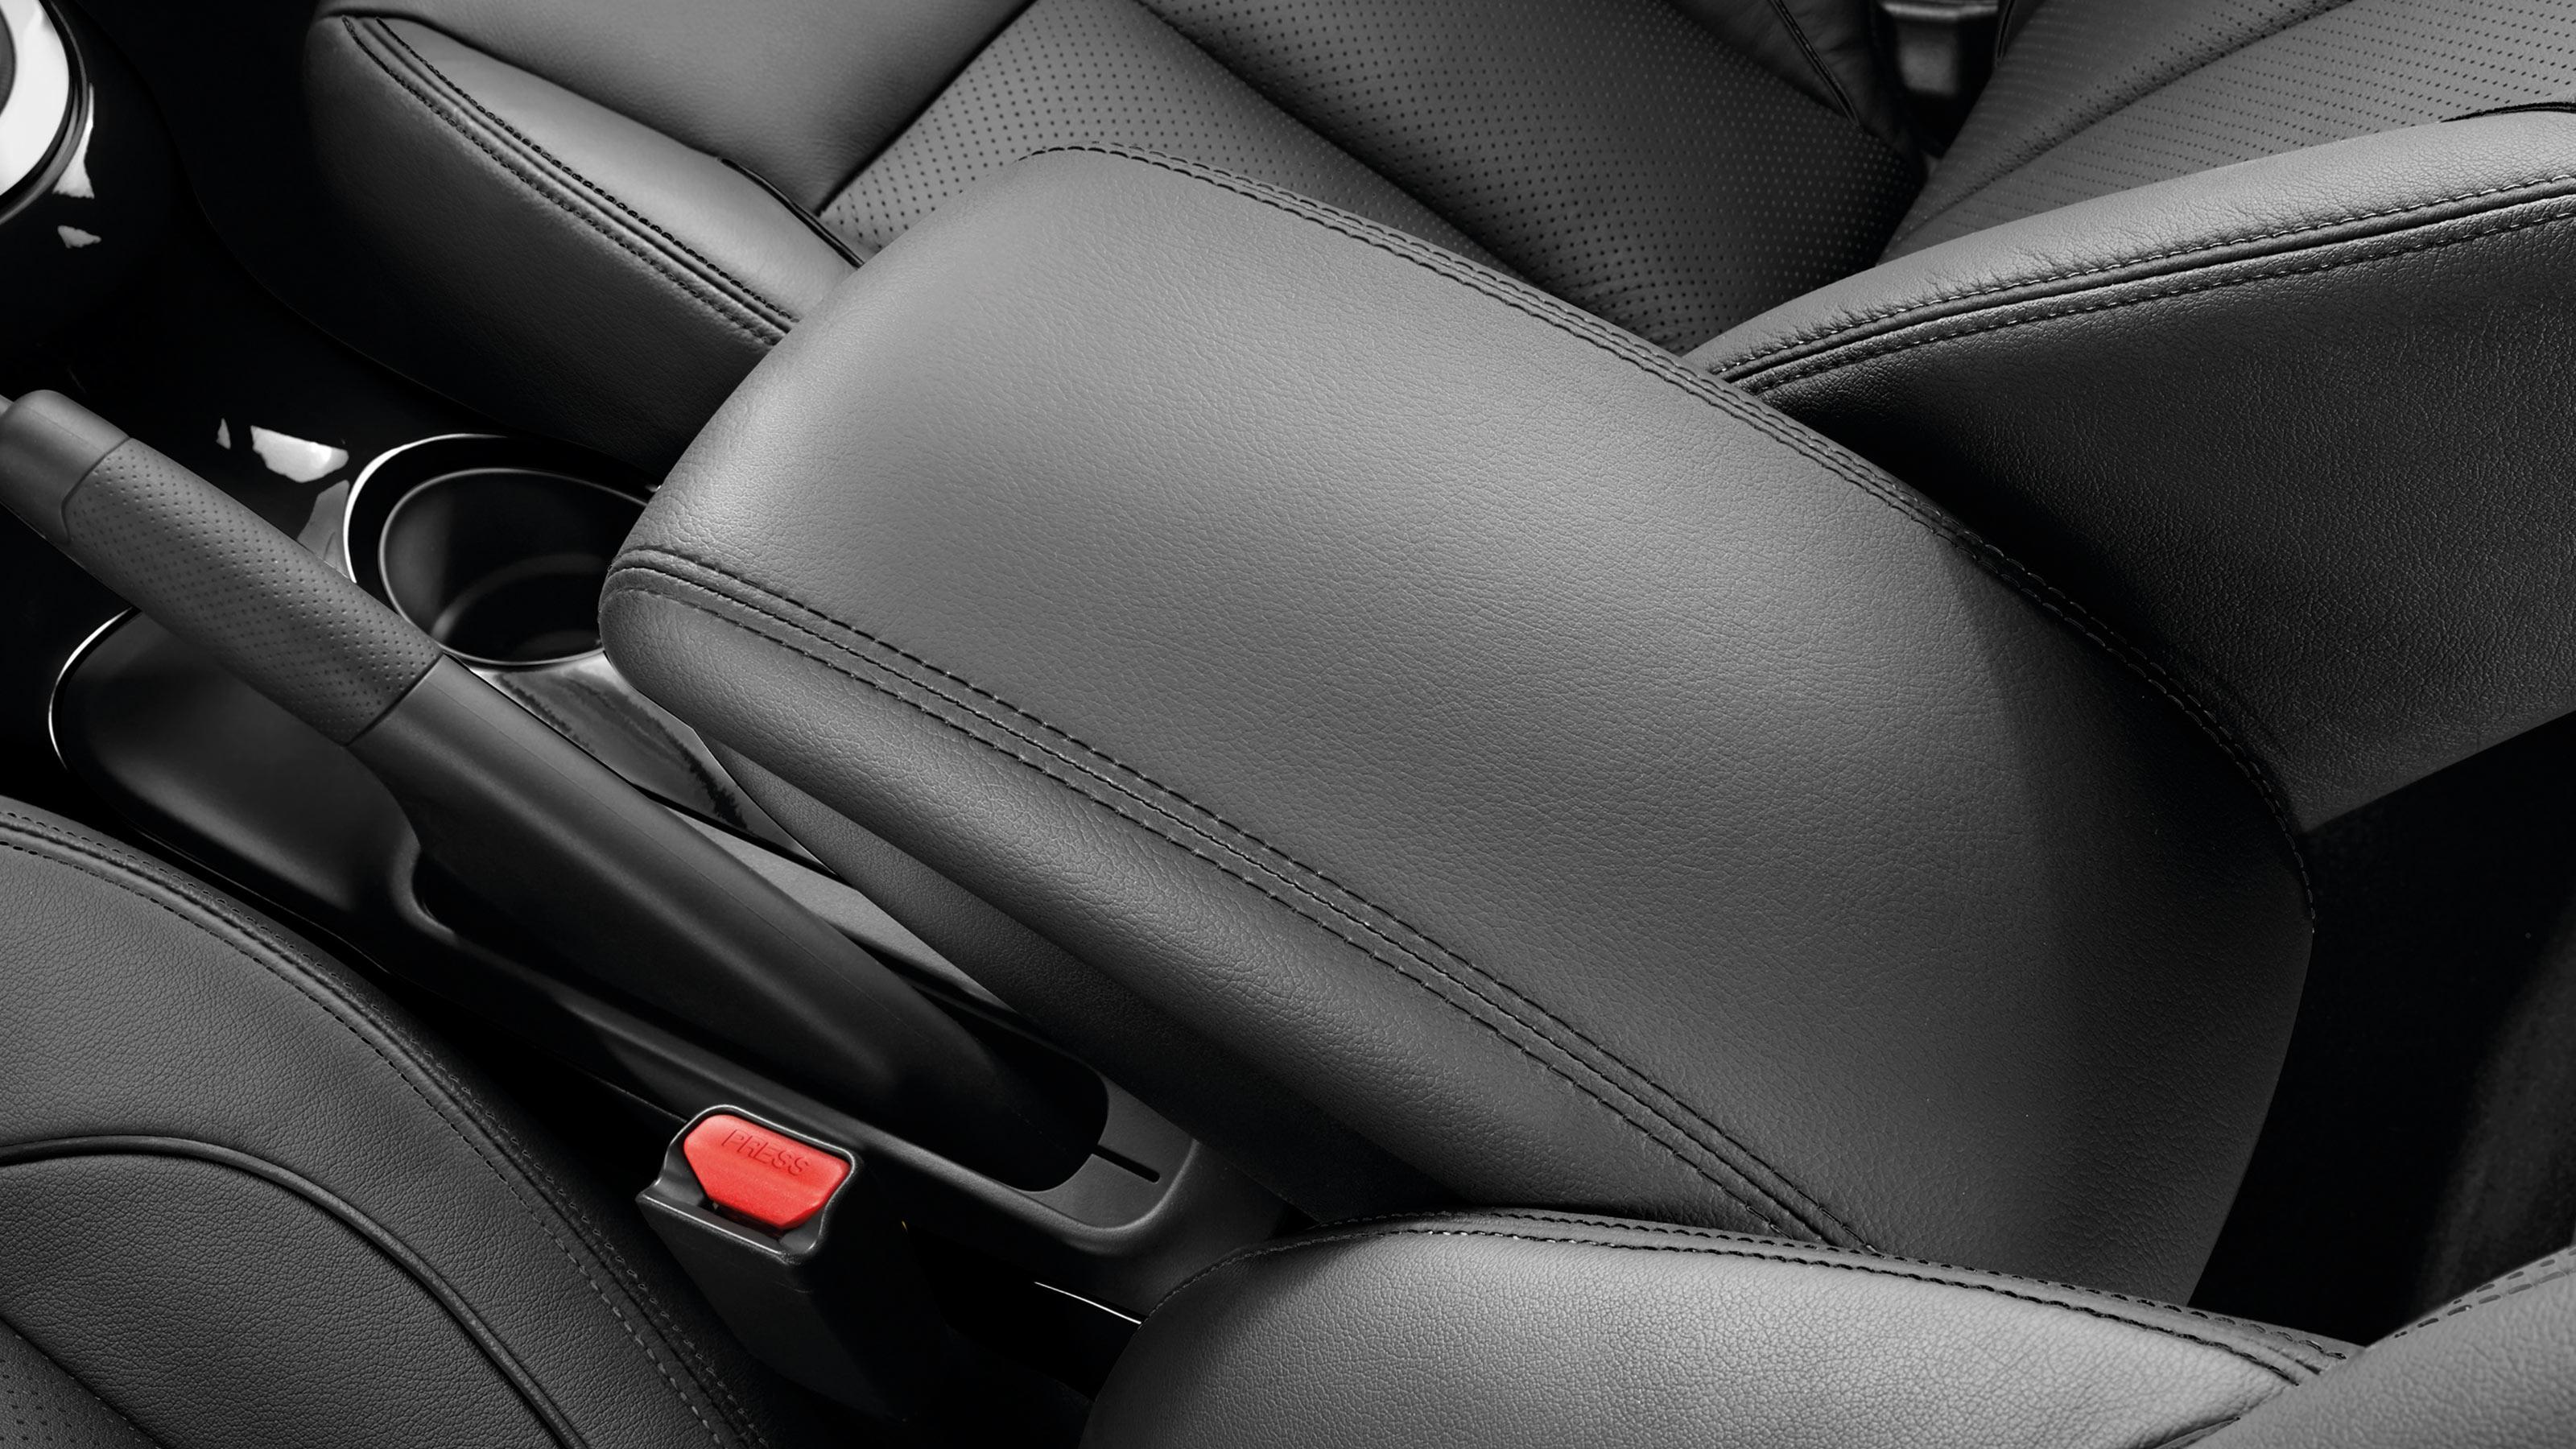 Nissan JUKE 2018: кожаный подлокотник